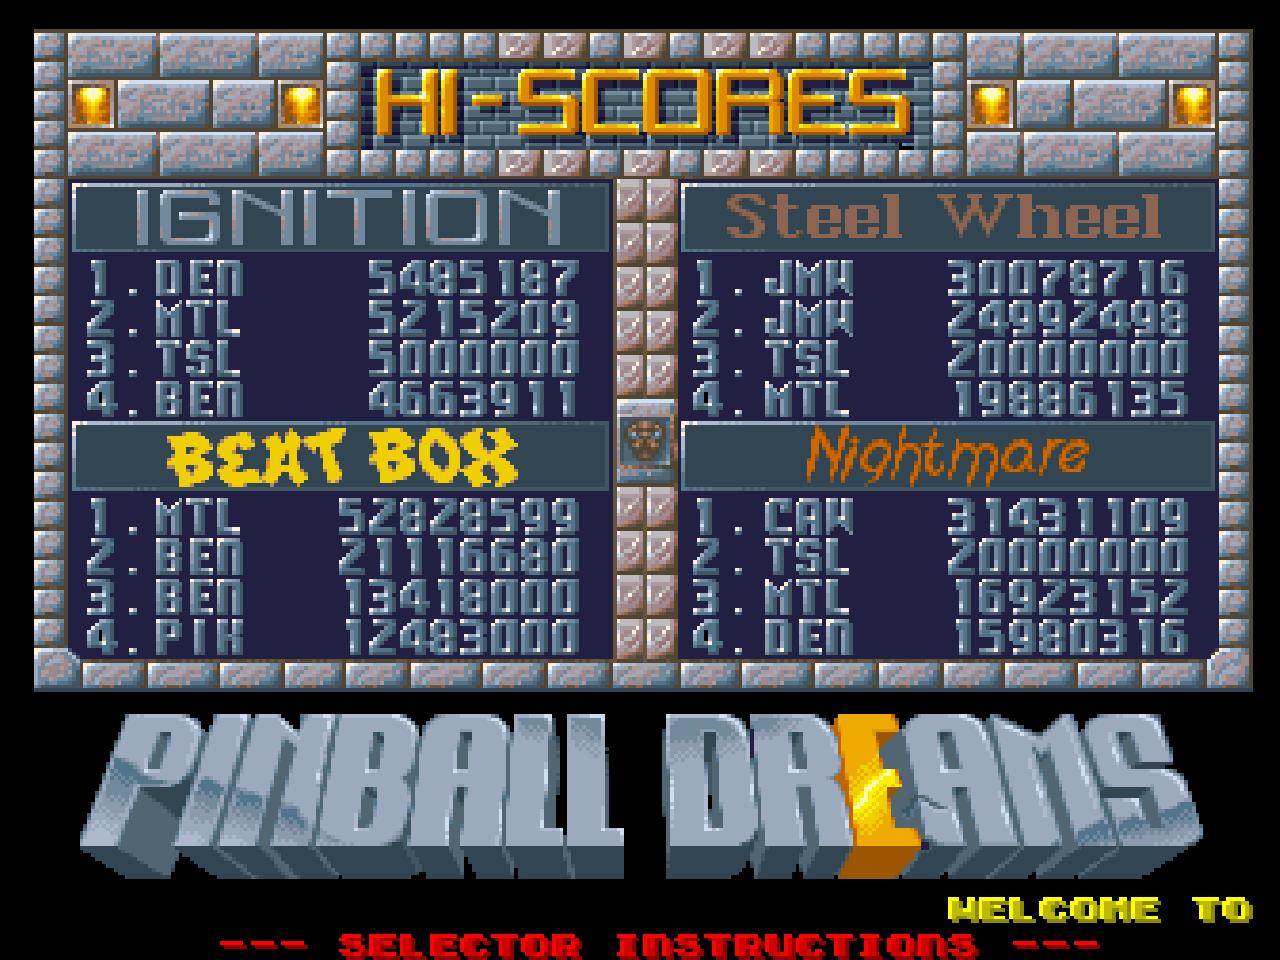 Mantalow: Pinball Dreams: Beat Box (Amiga Emulated) 52,828,599 points on 2015-05-12 06:50:08